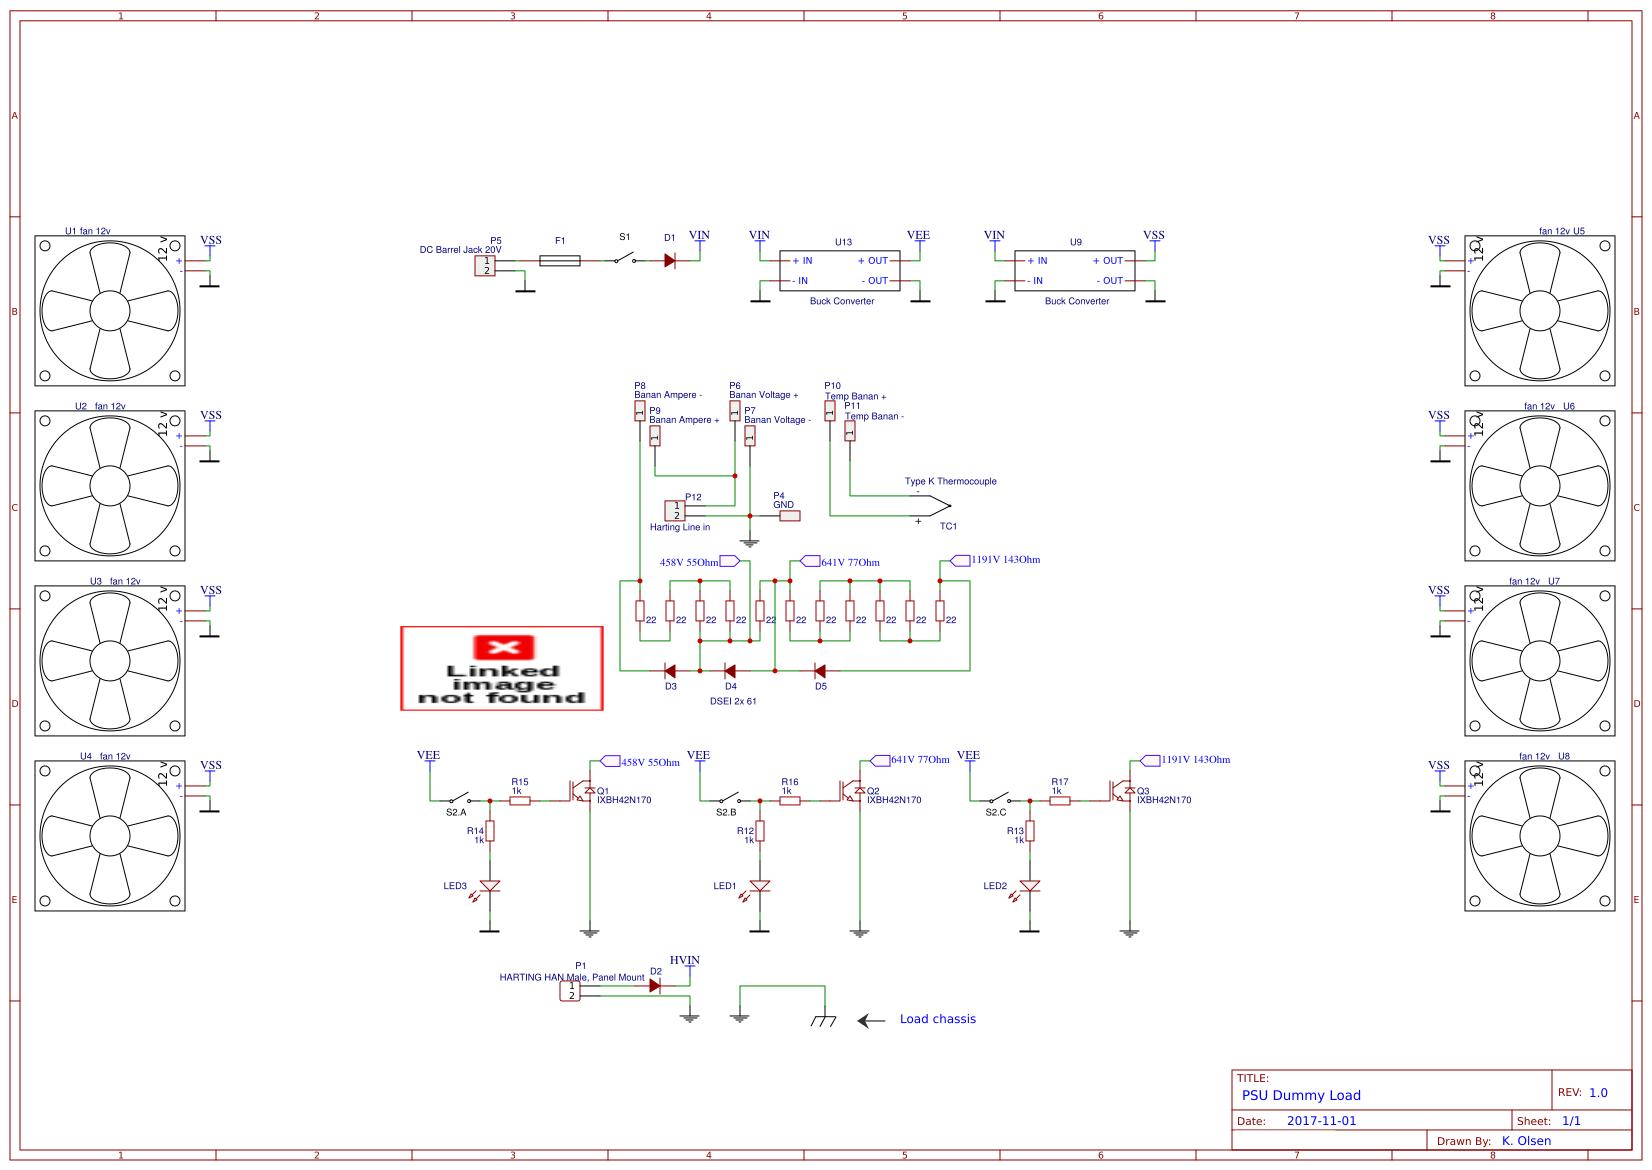 Psu Dummy Load Easyeda Circuit Constant Current Schema Schematic